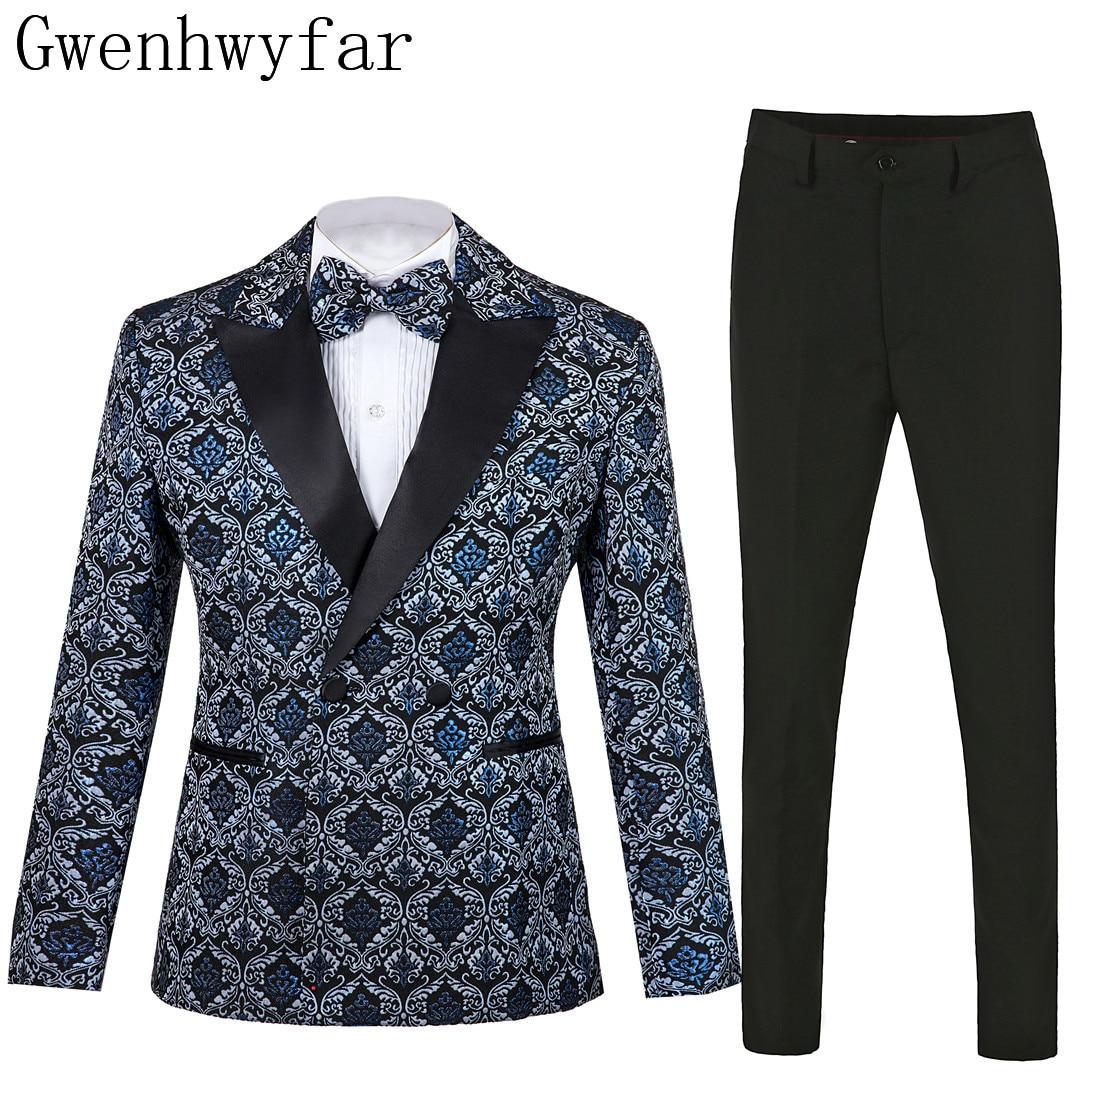 Paisley /& Gray Mens Slim Fit Peak Lapel Jacquard Dinner Jacket